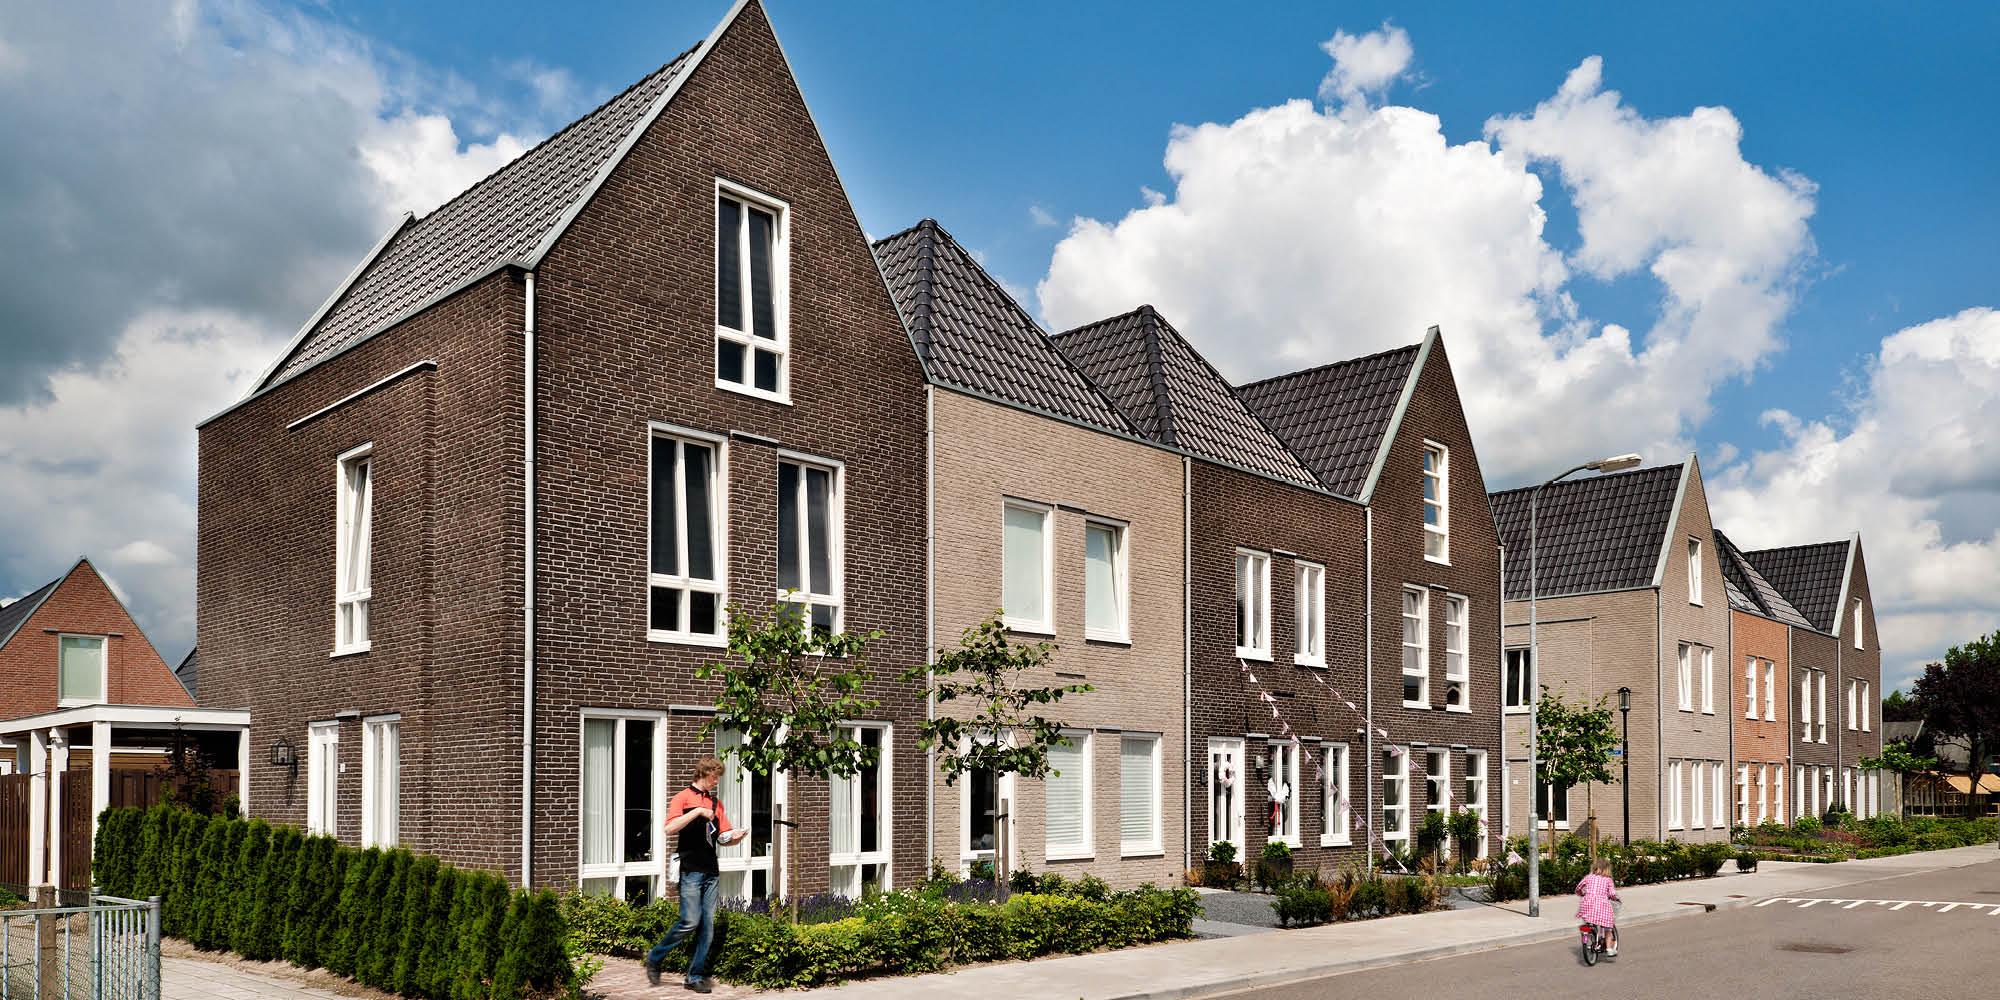 151-Leesonhof-Ederveen